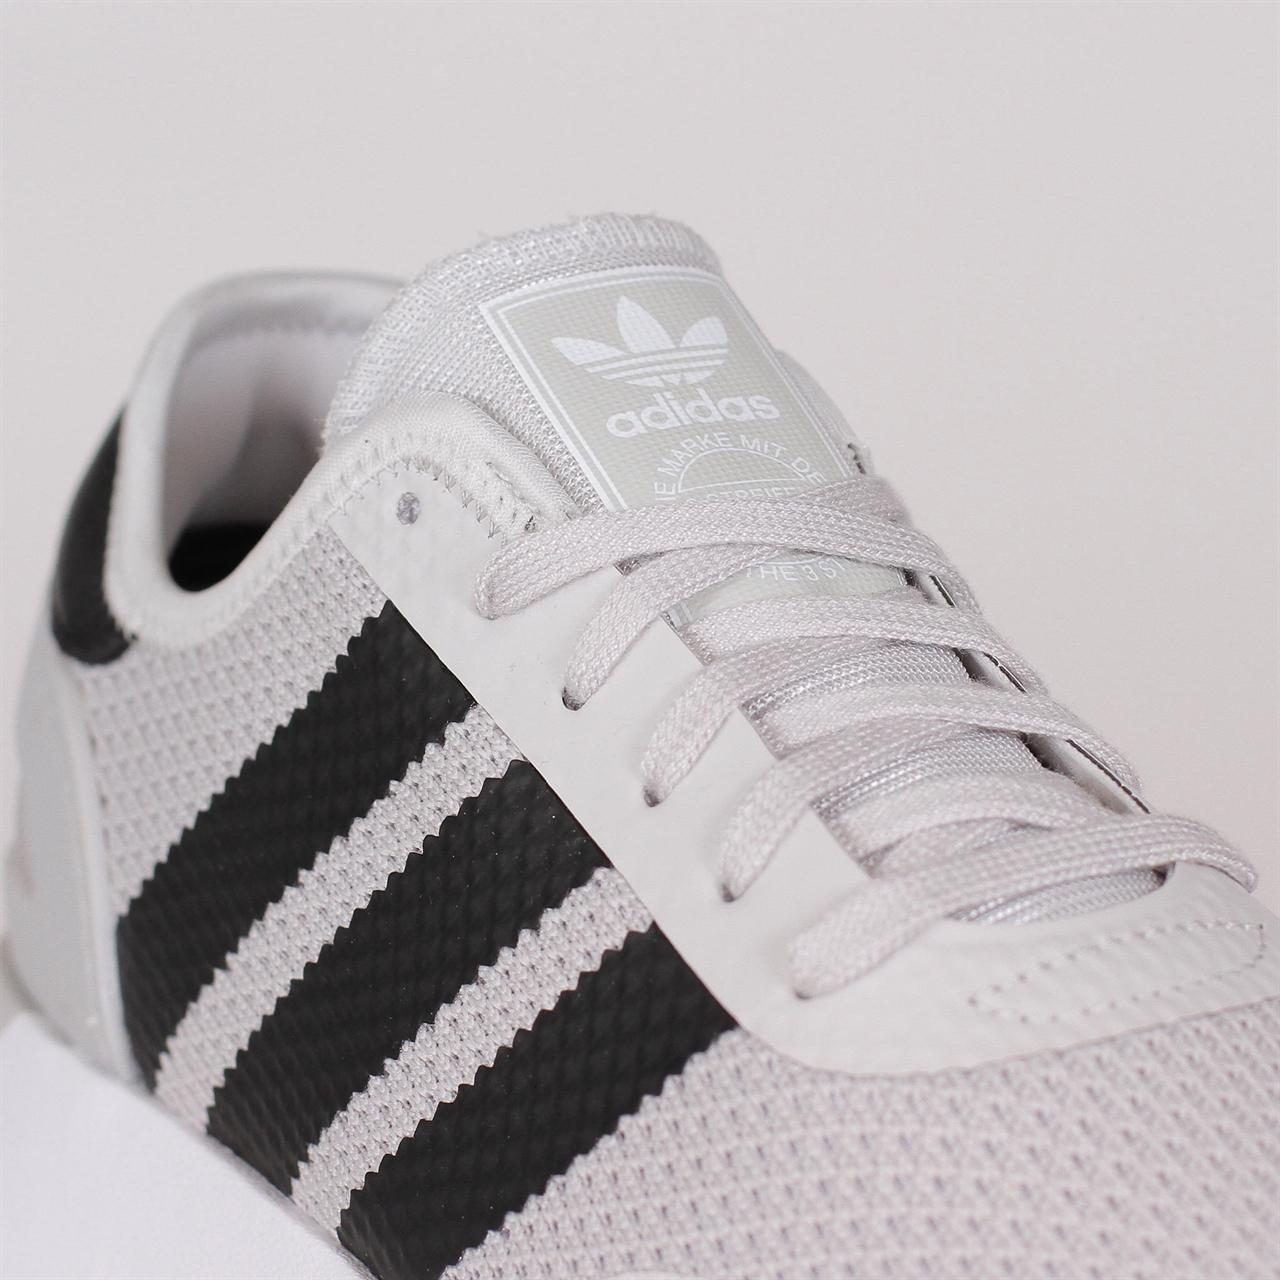 online retailer 48c7b 7f2f1 Adidas OriginalsAdidas Originals N-5923 (AQ1125). 1